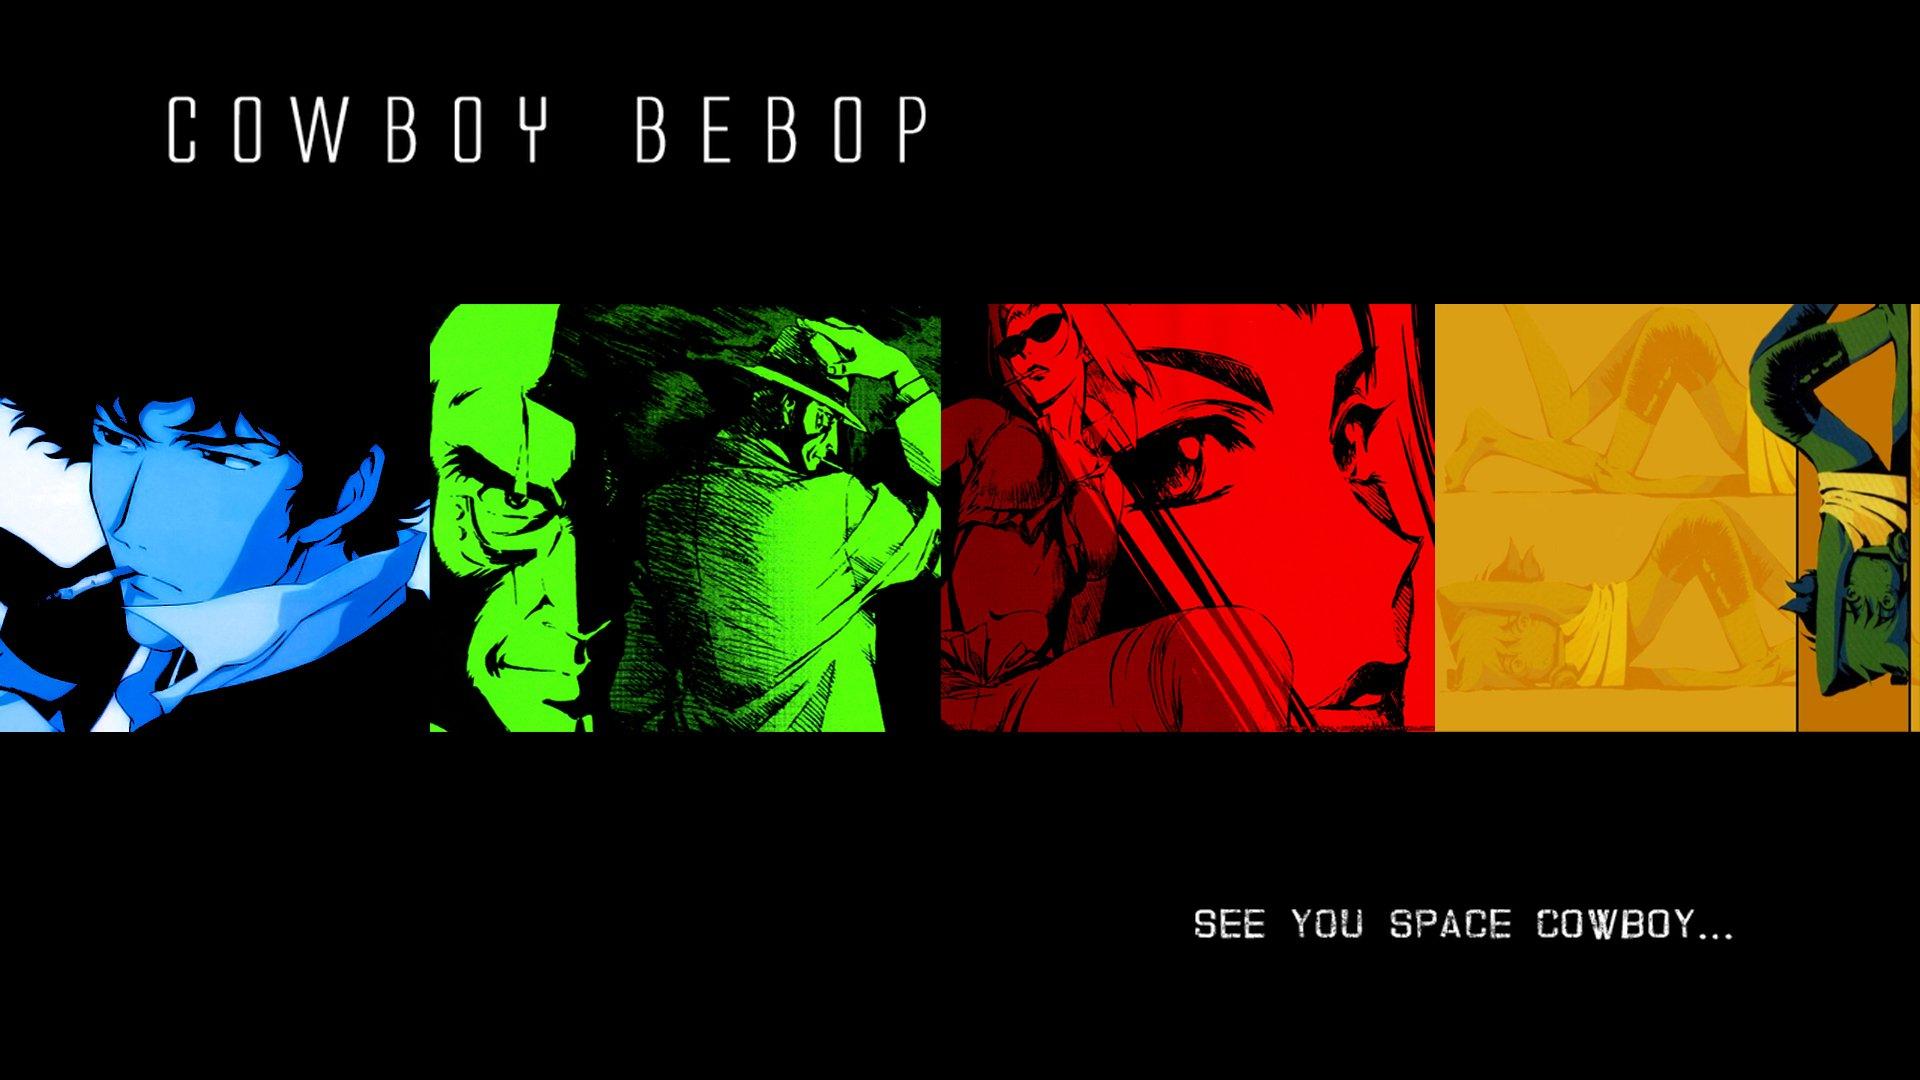 49 Cowboy Bebop Hd Wallpapers Background Images Wallpaper